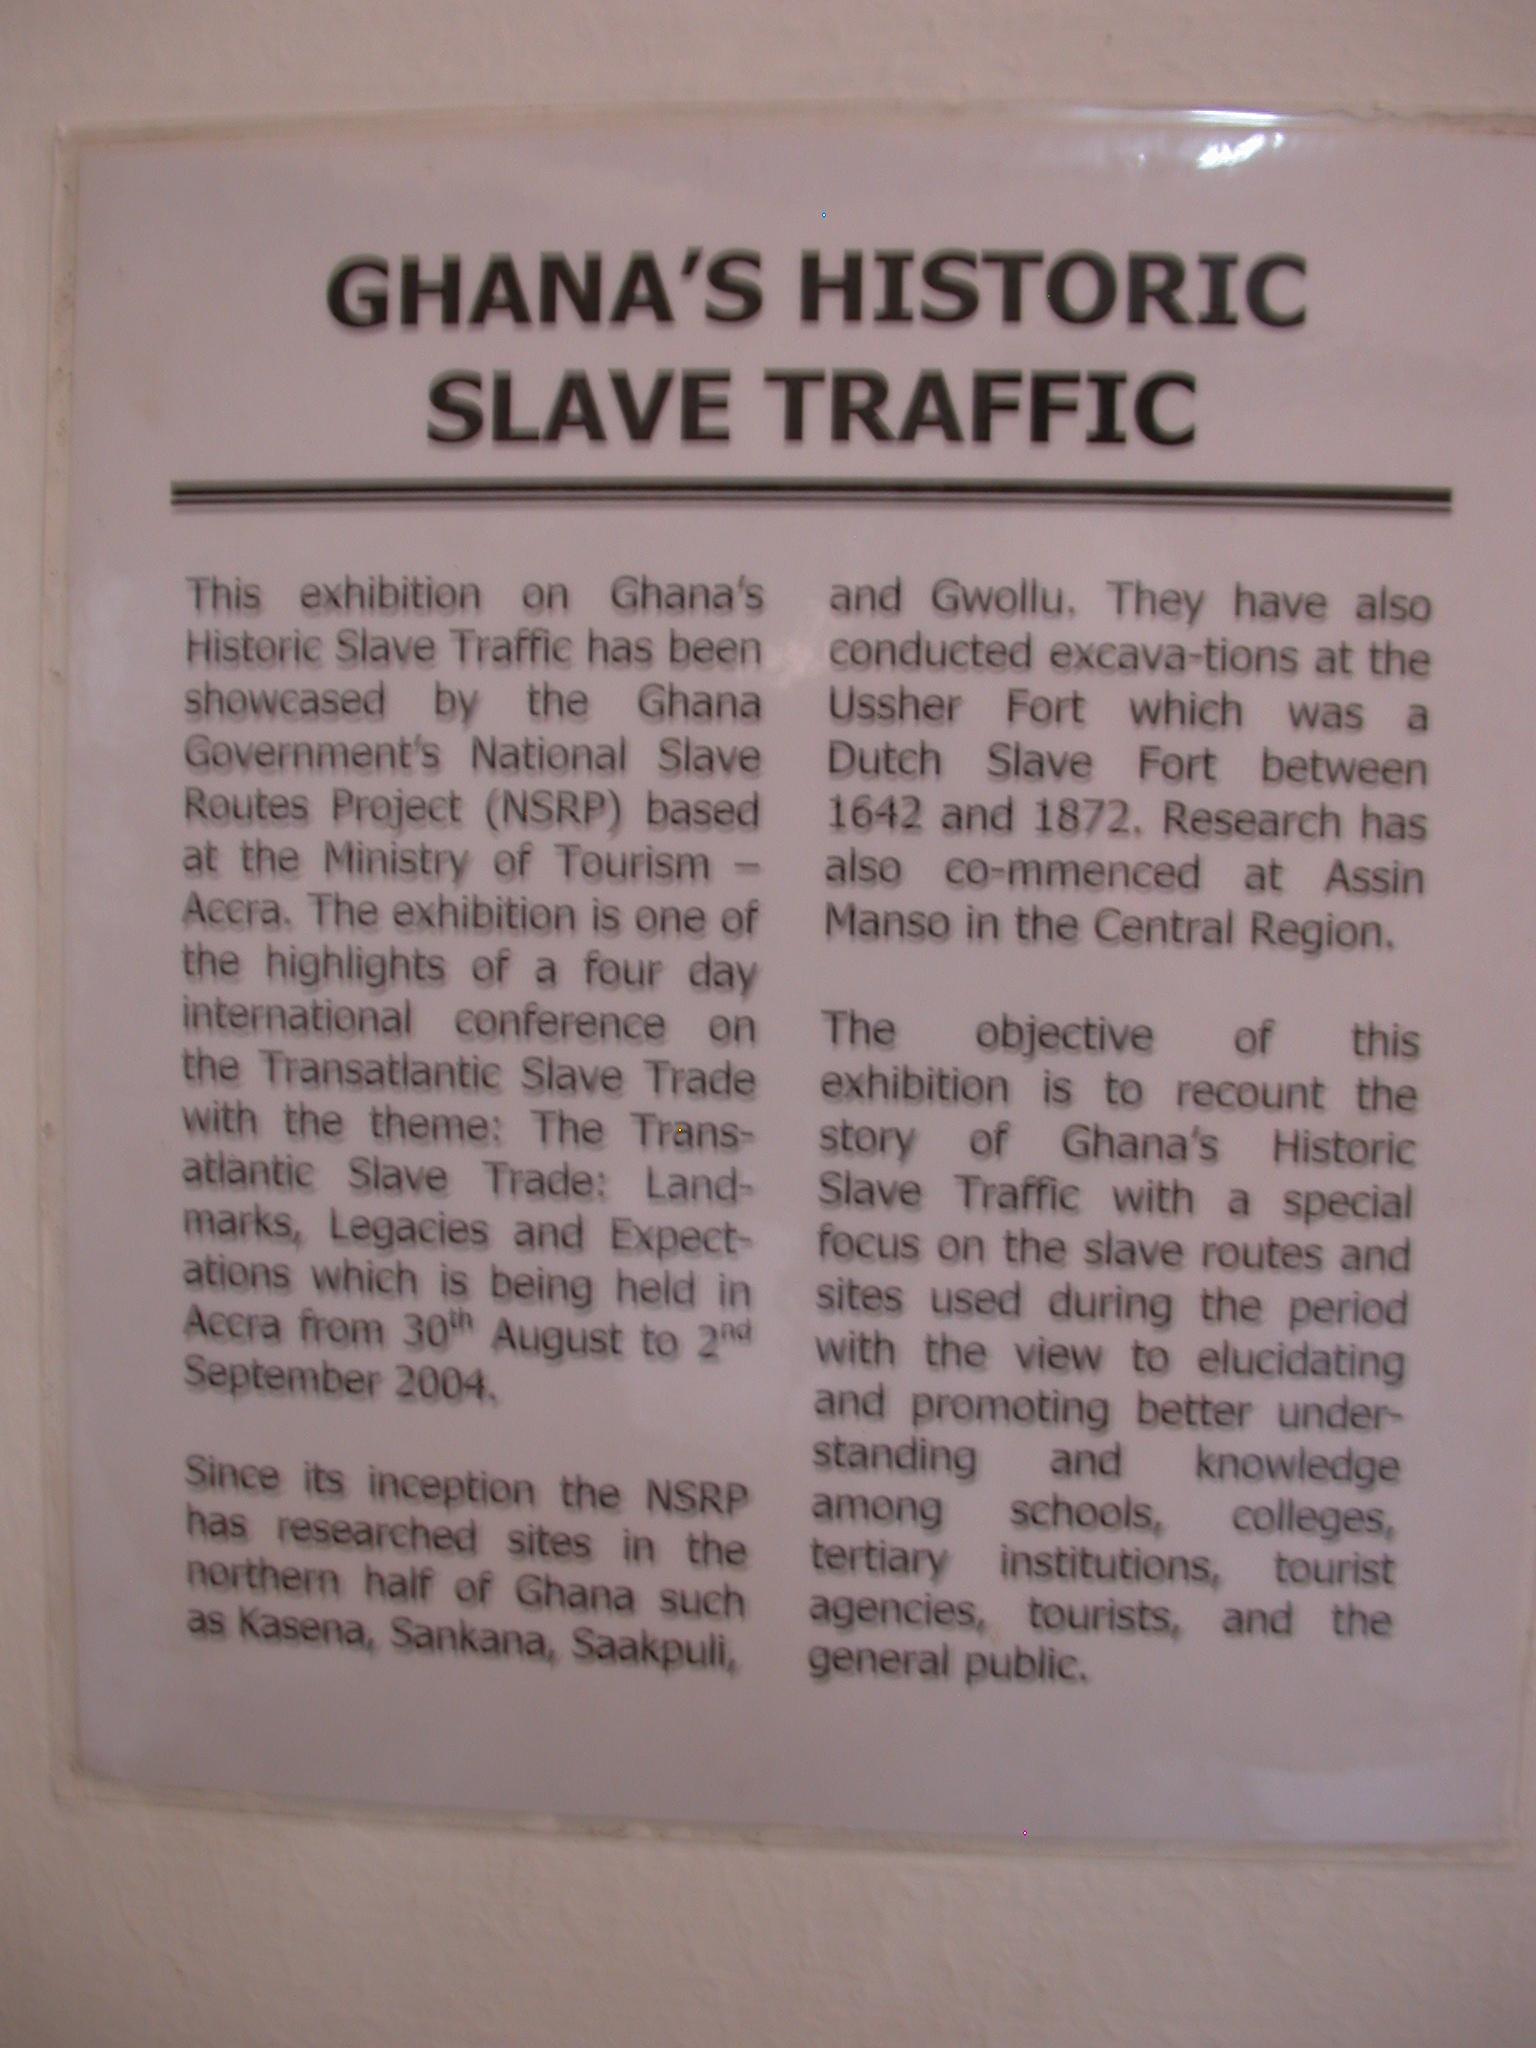 Ghana Slave Traffic Description, National Museum, Accra, Ghana